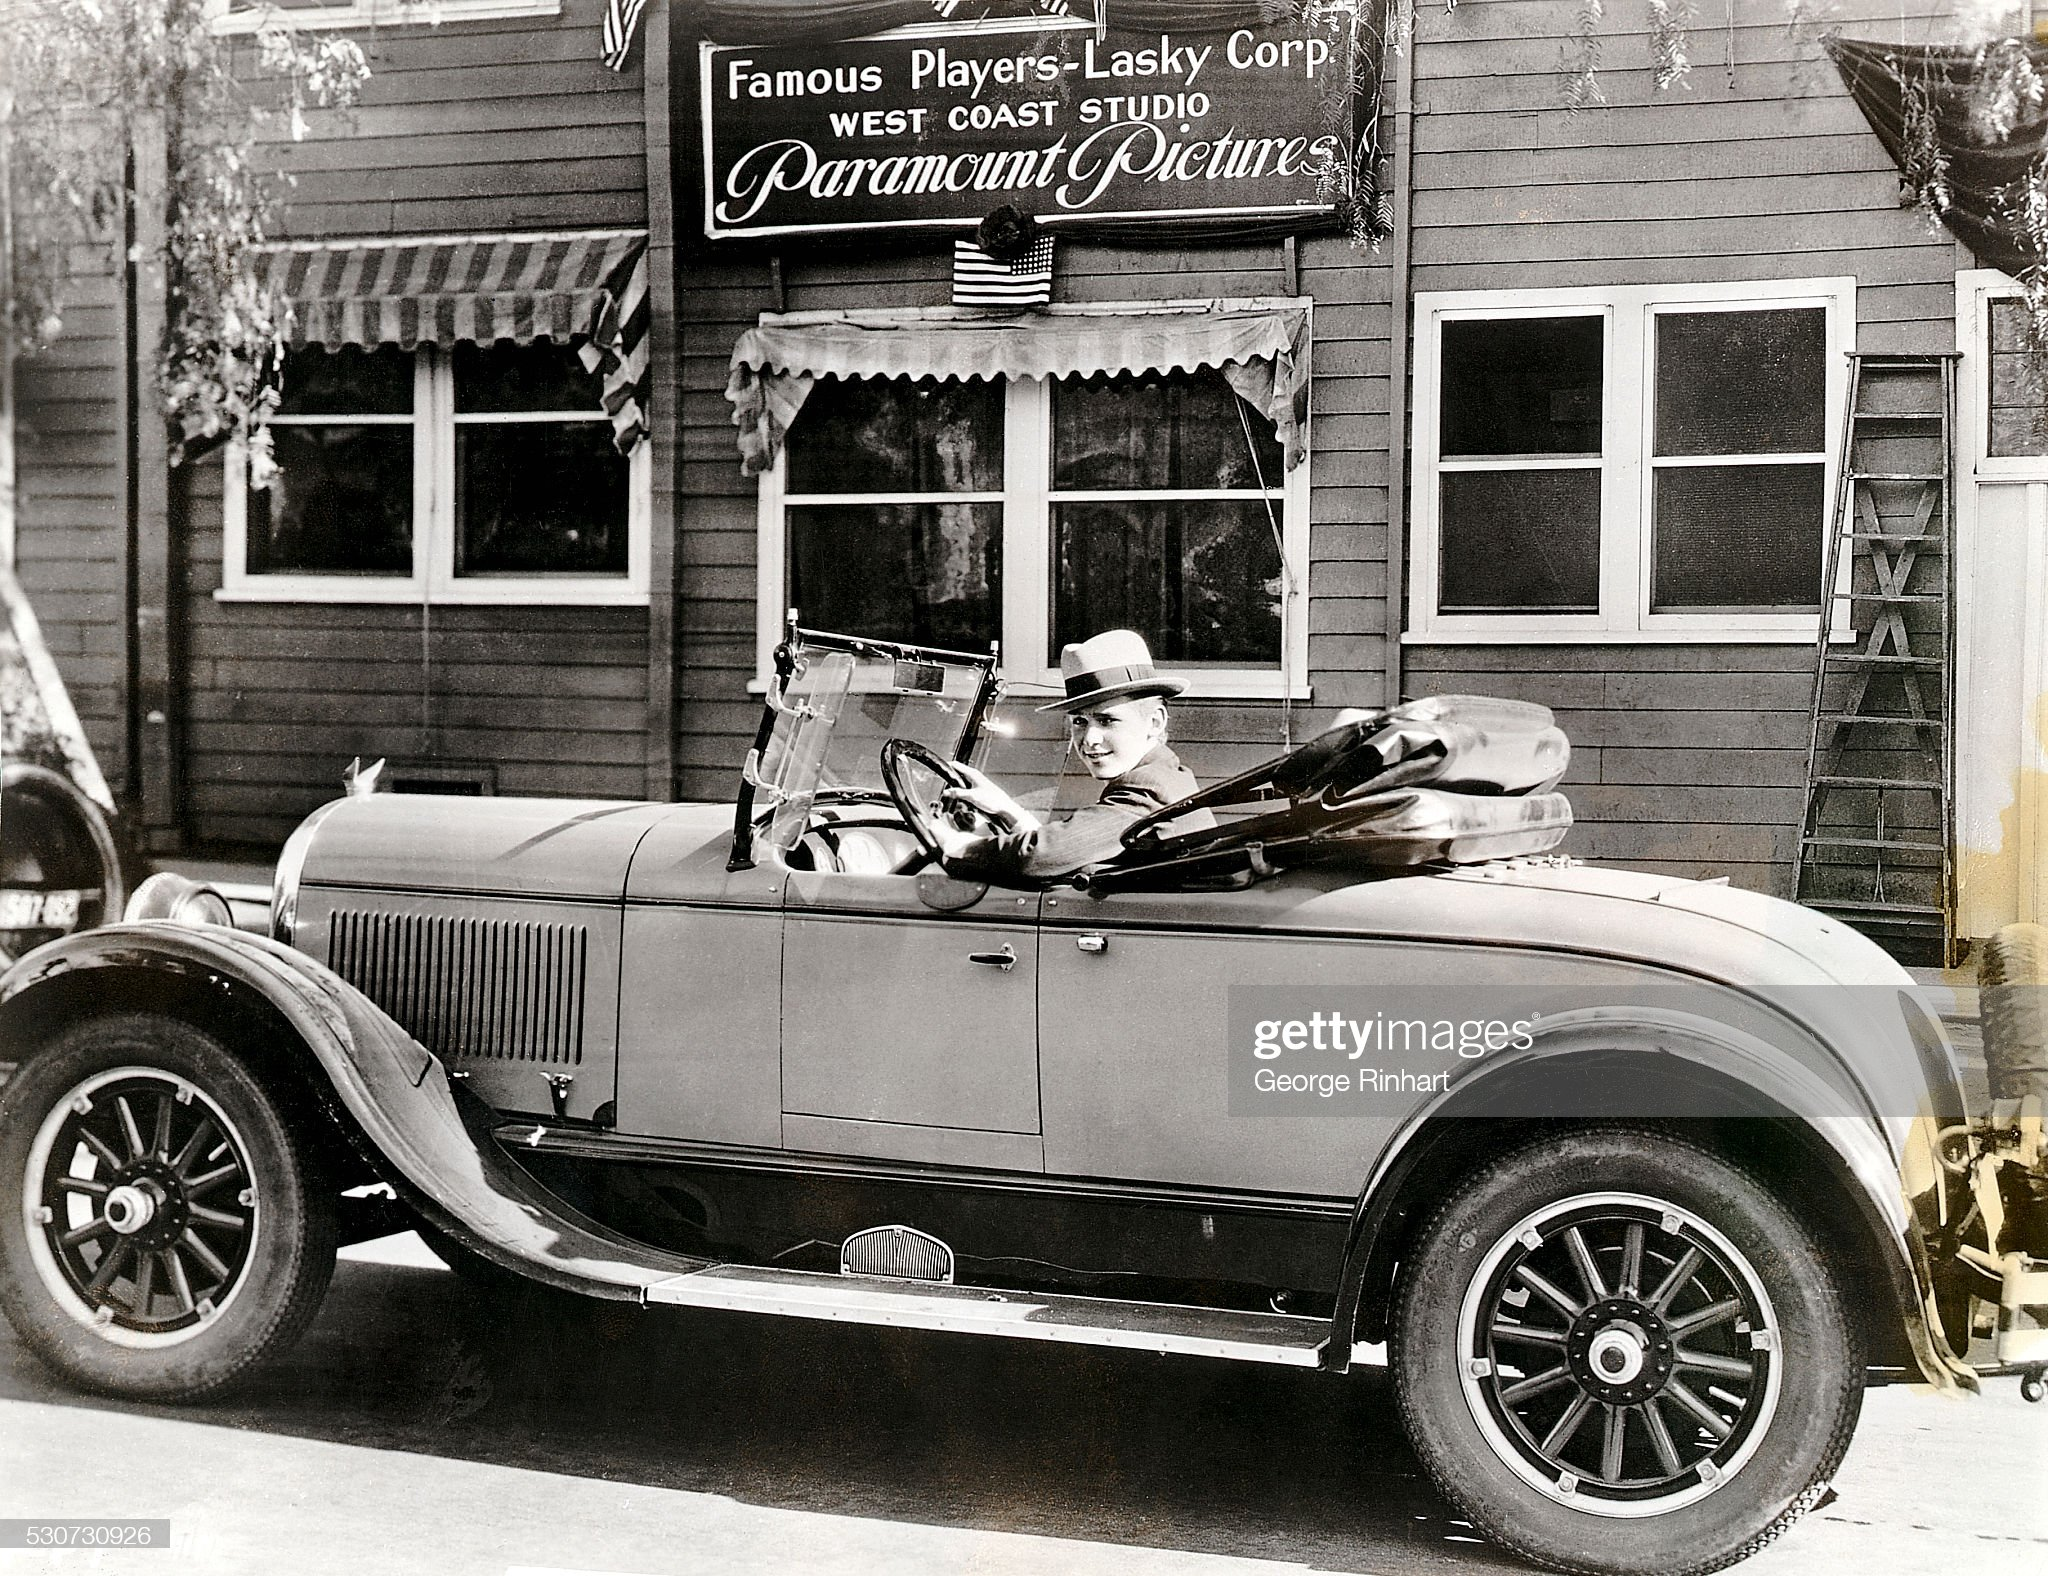 Douglas Fairbanks Jr. at Studio in Car : News Photo